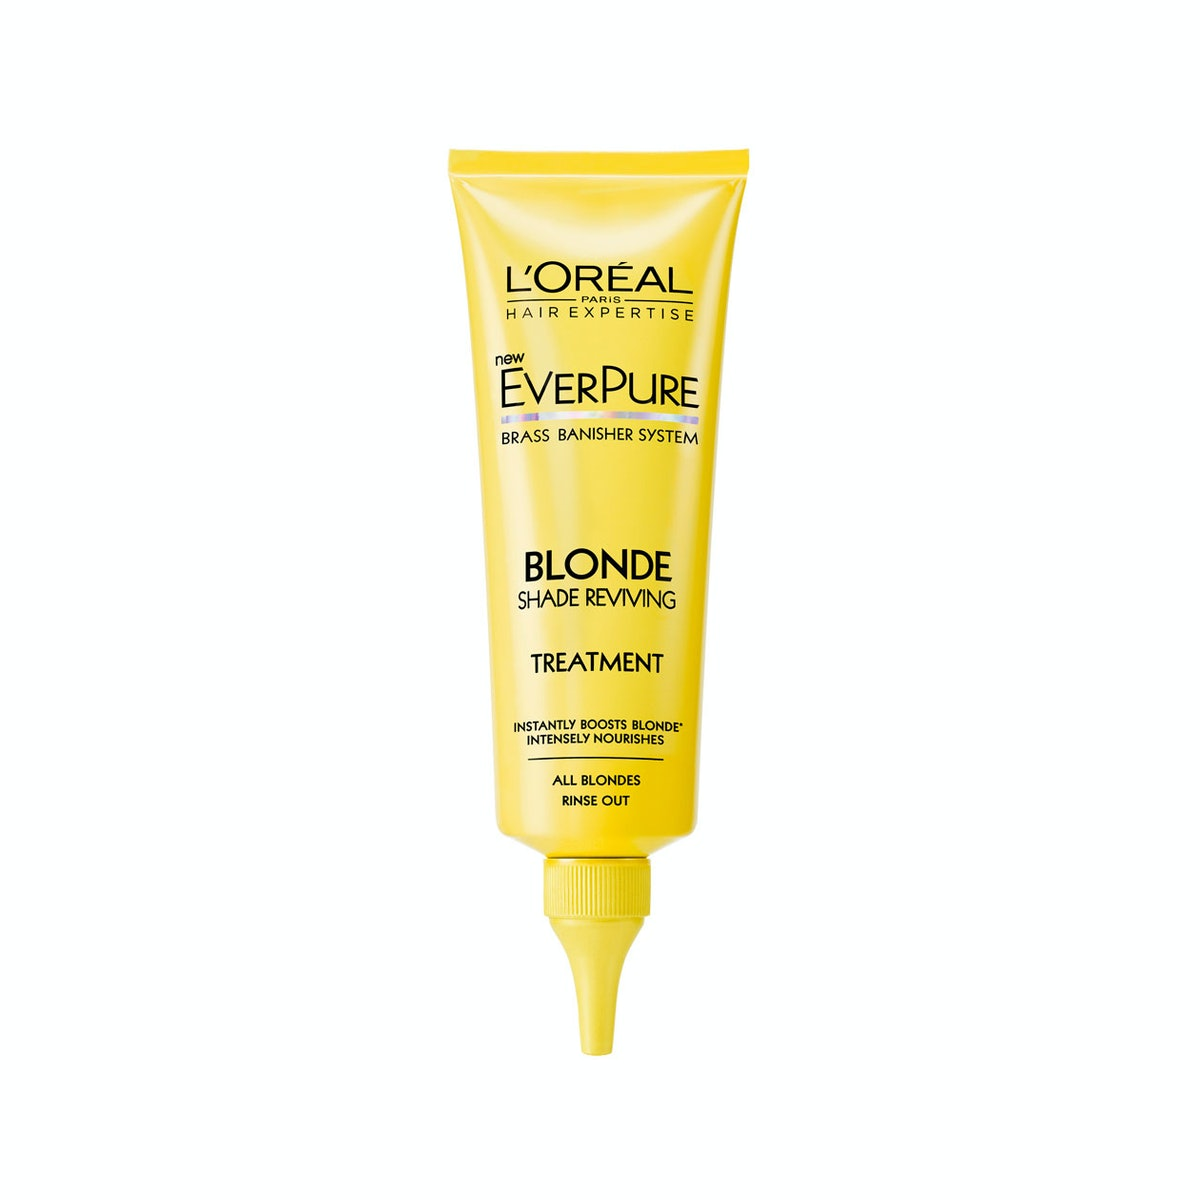 L'Oréal EverPure Blonde Shade Reviving Treatment